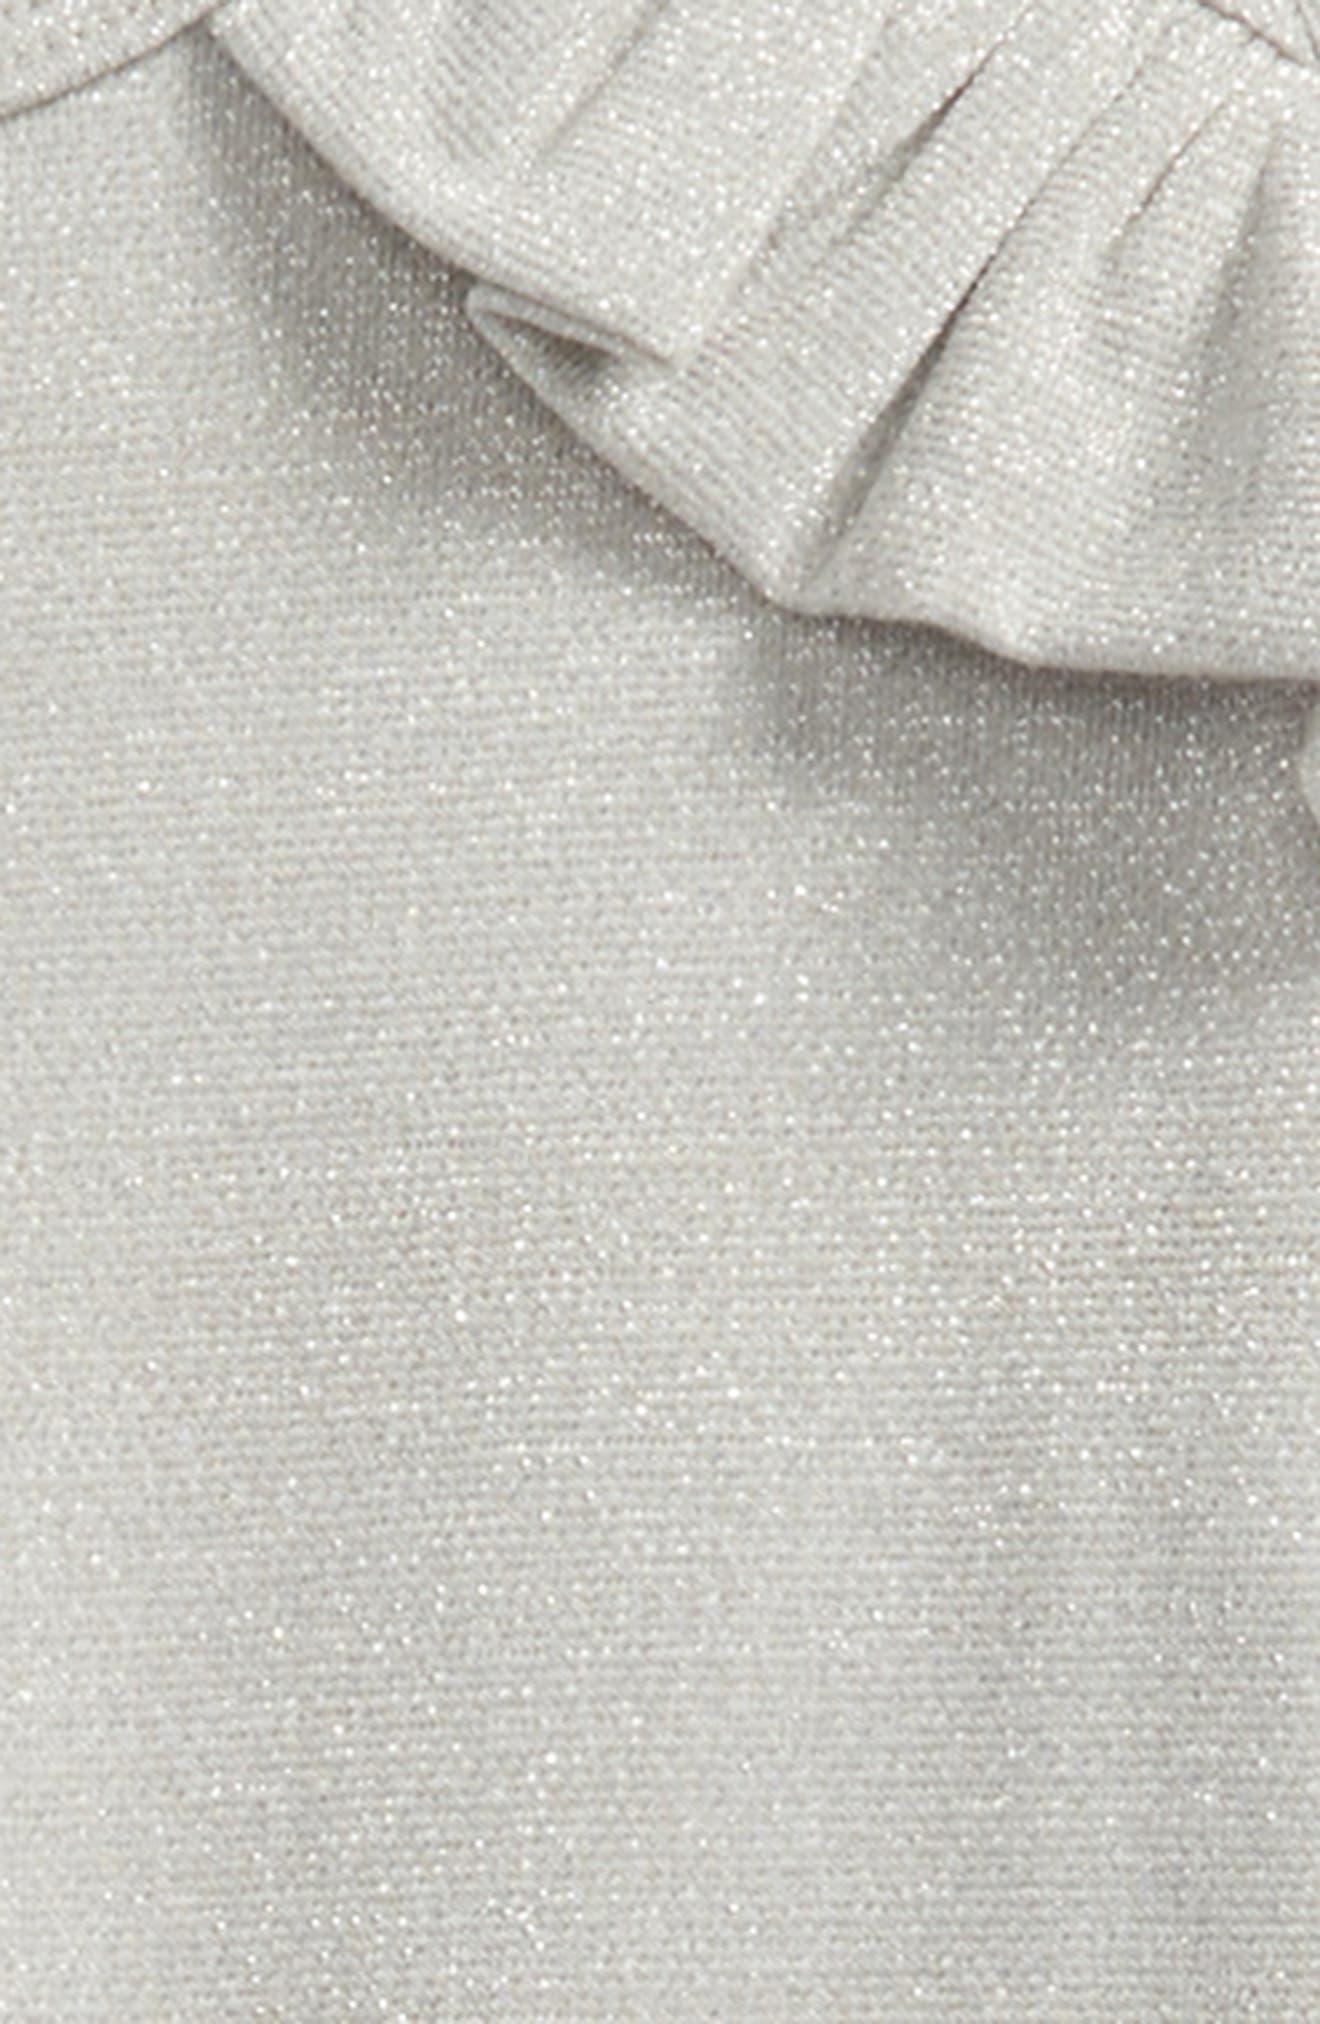 Cold Shoulder Top,                             Alternate thumbnail 2, color,                             Silver